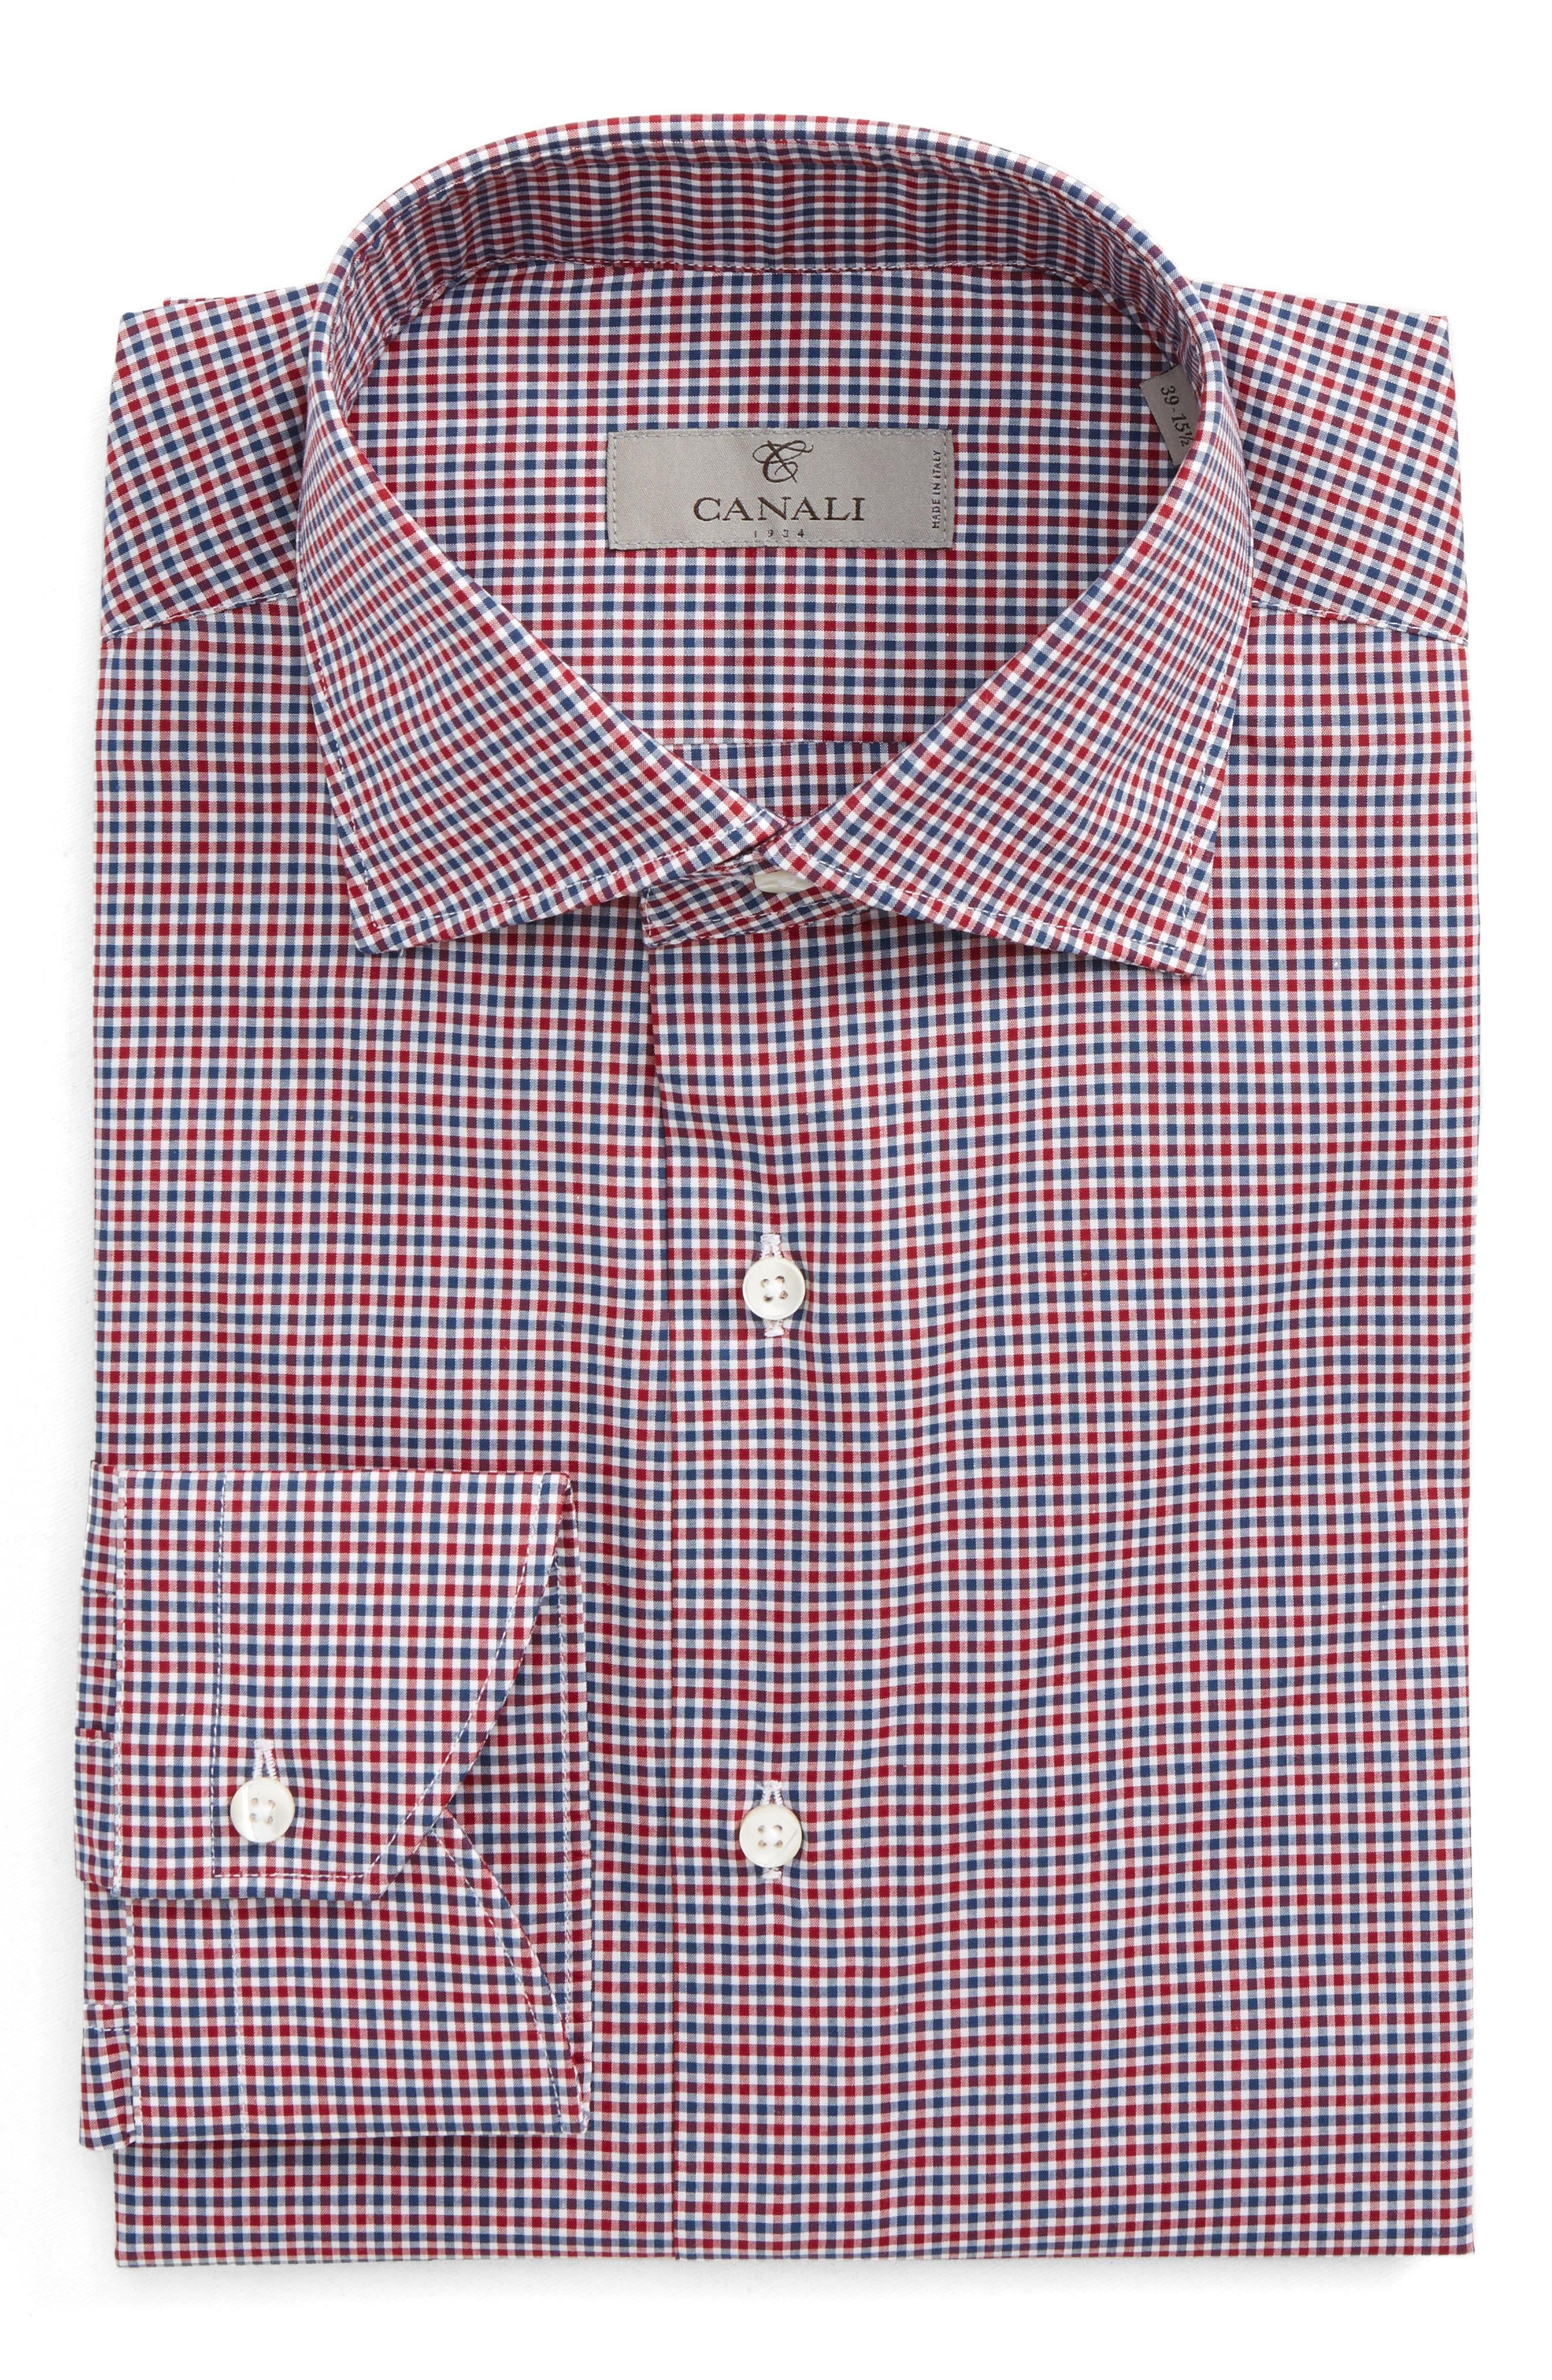 Regular Fit Dress Shirt,                             Main thumbnail 1, color,                             Bright Red/ Blue